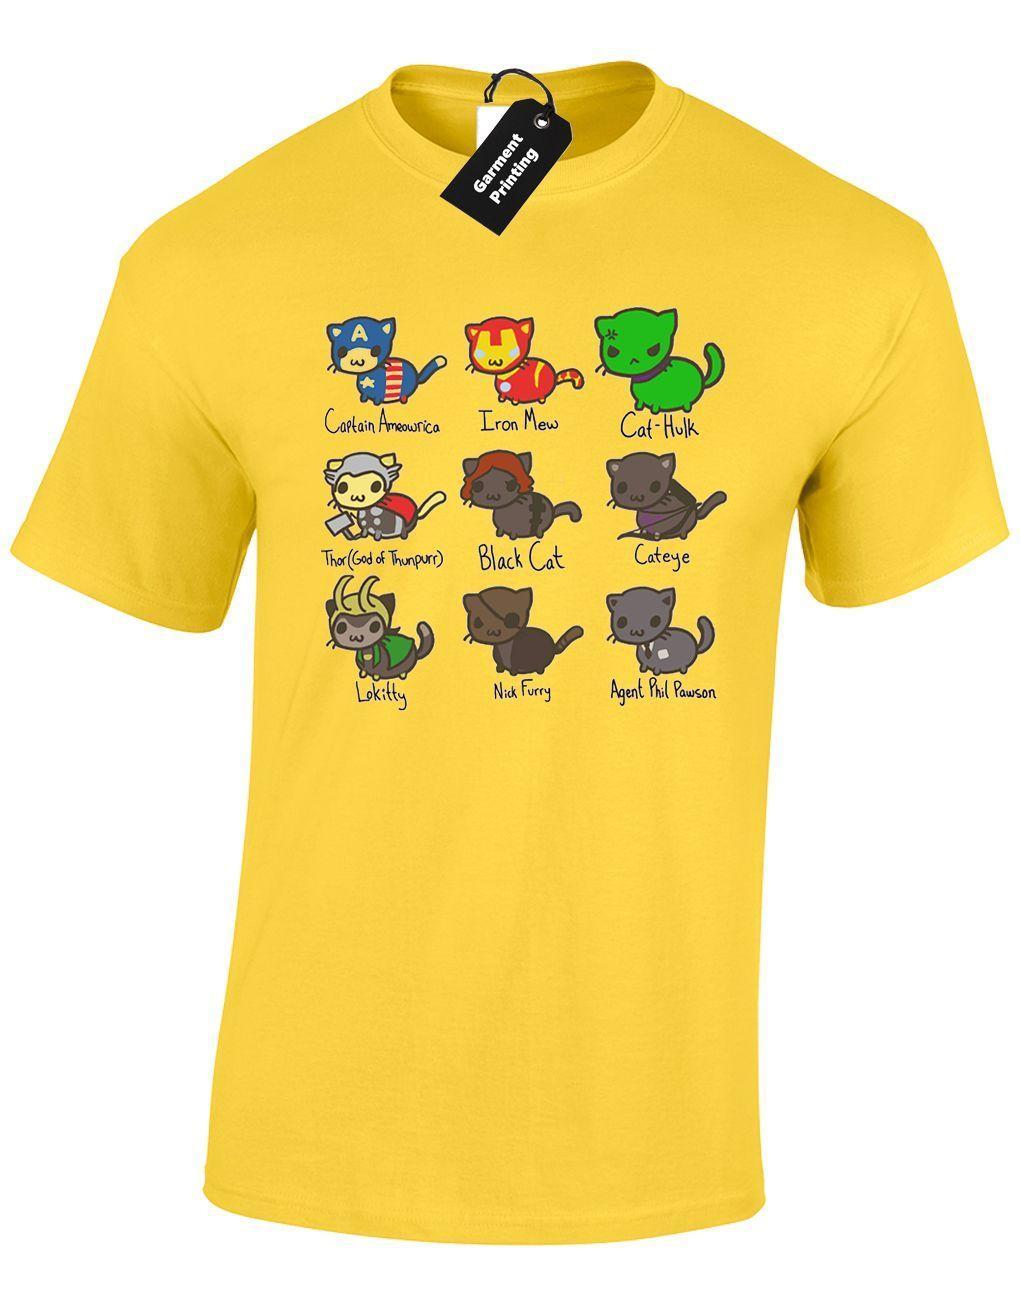 268d0e1fa6d CAT AVENGERS UNISEX T SHIRT SUPERHERO CAPTAIN KITTY AMERICA CUTE KITTEN TOP  Cartoon T Shirt Men Unisex New Be Awesome T Shirt Print On Tee Shirt From  ...